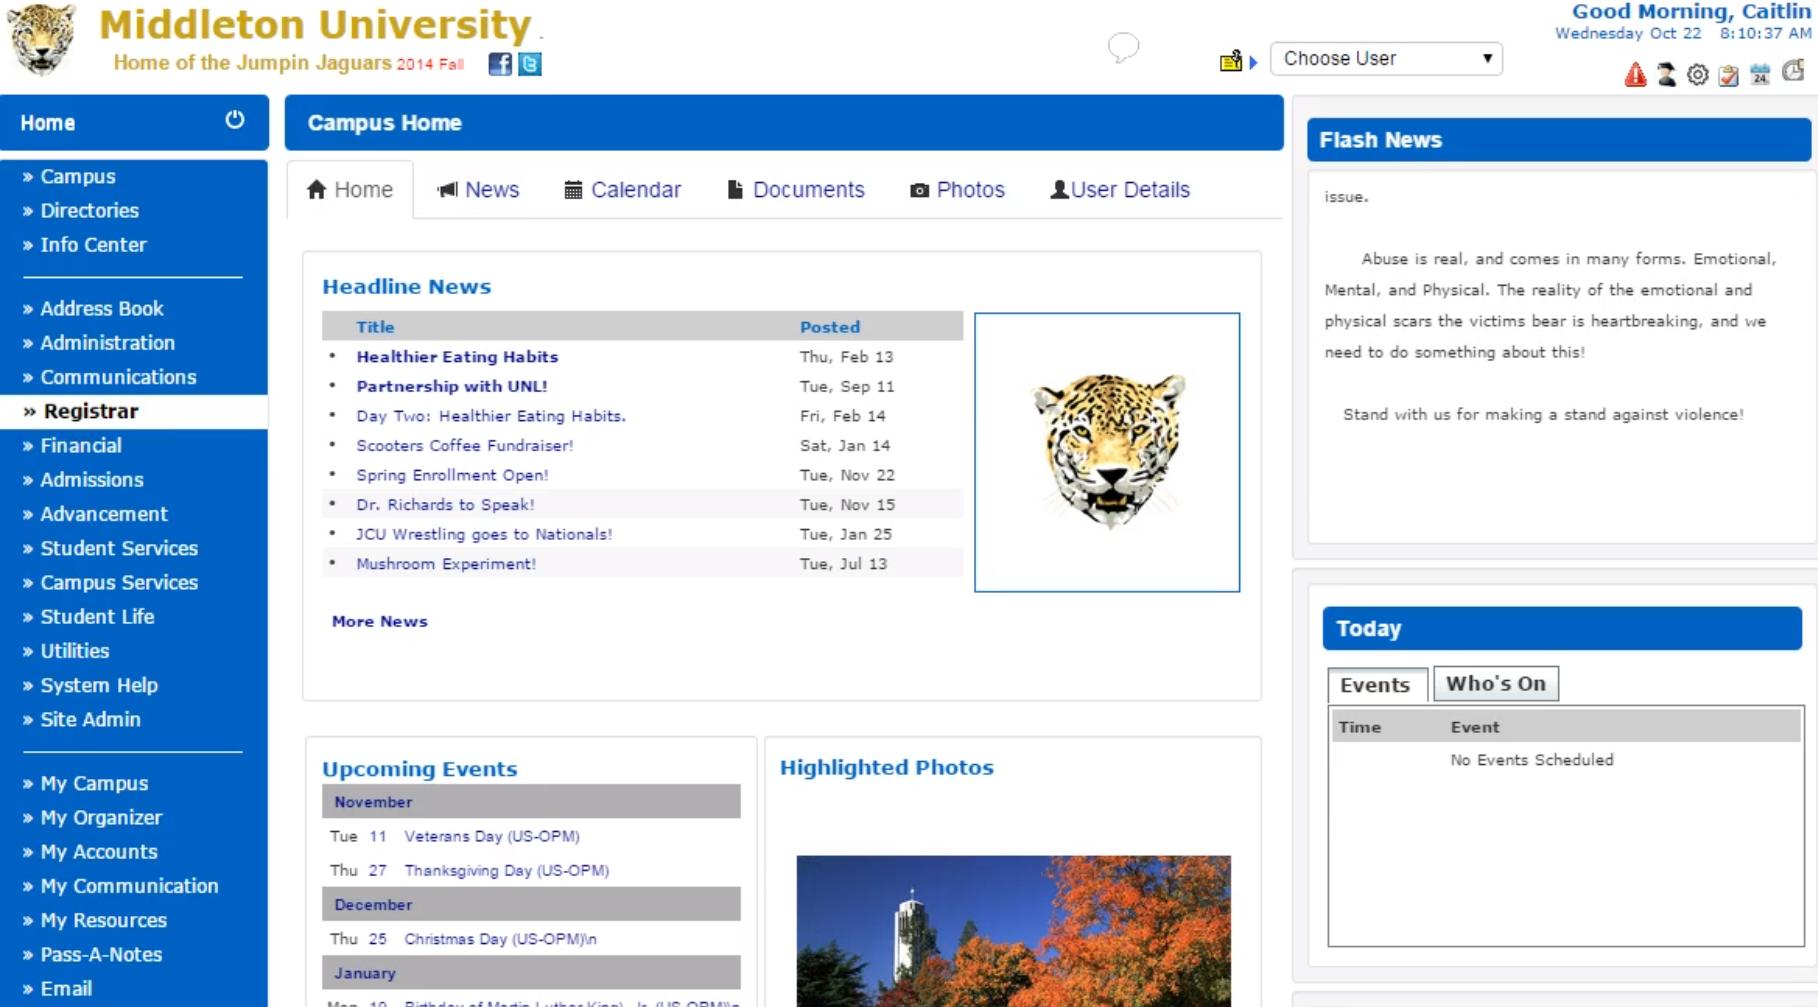 Sycamore Campus homepage